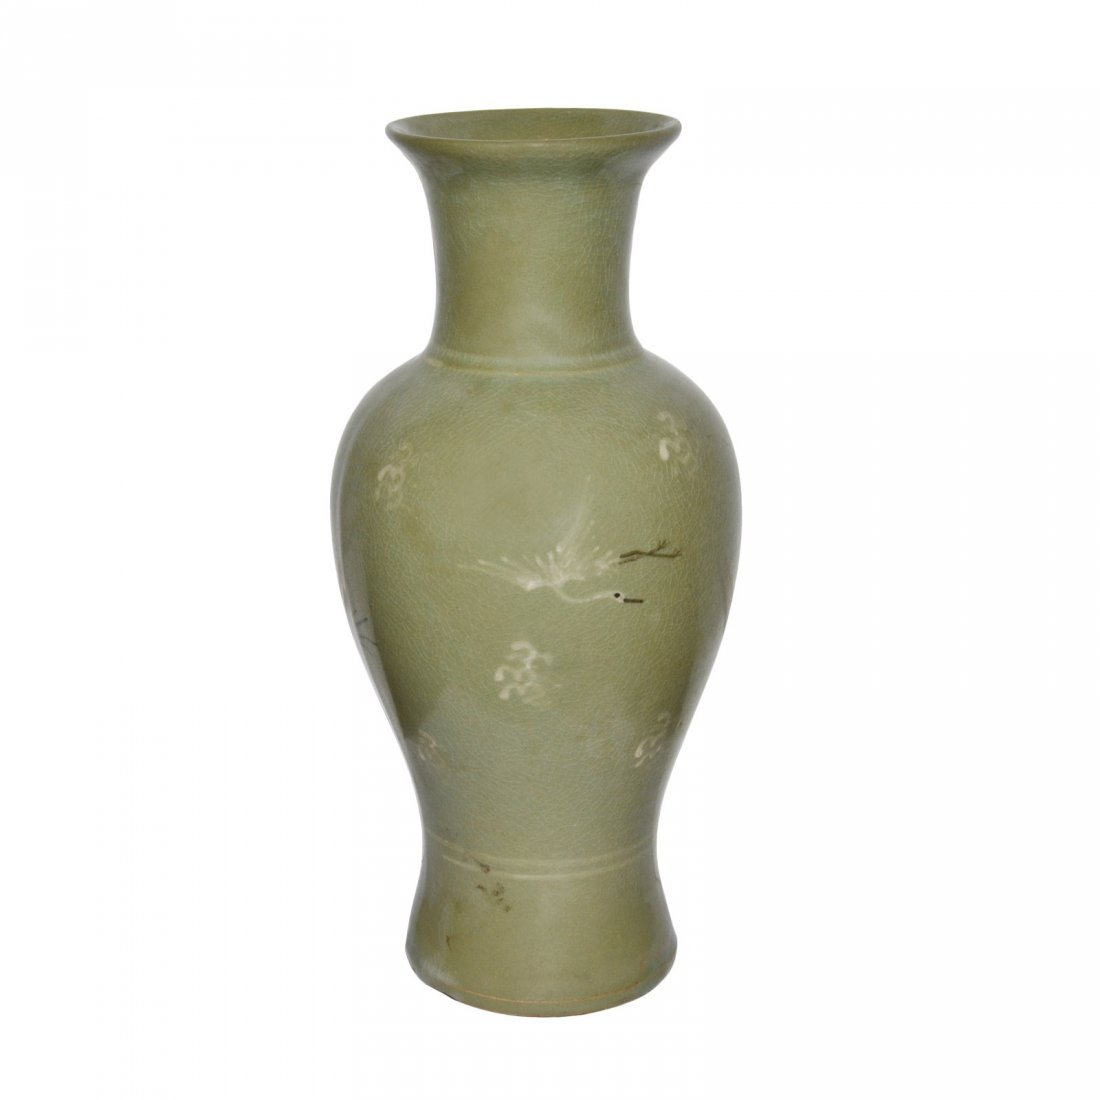 Korea, 19th Century Celadon-Glazed Crane and Cloud Guan